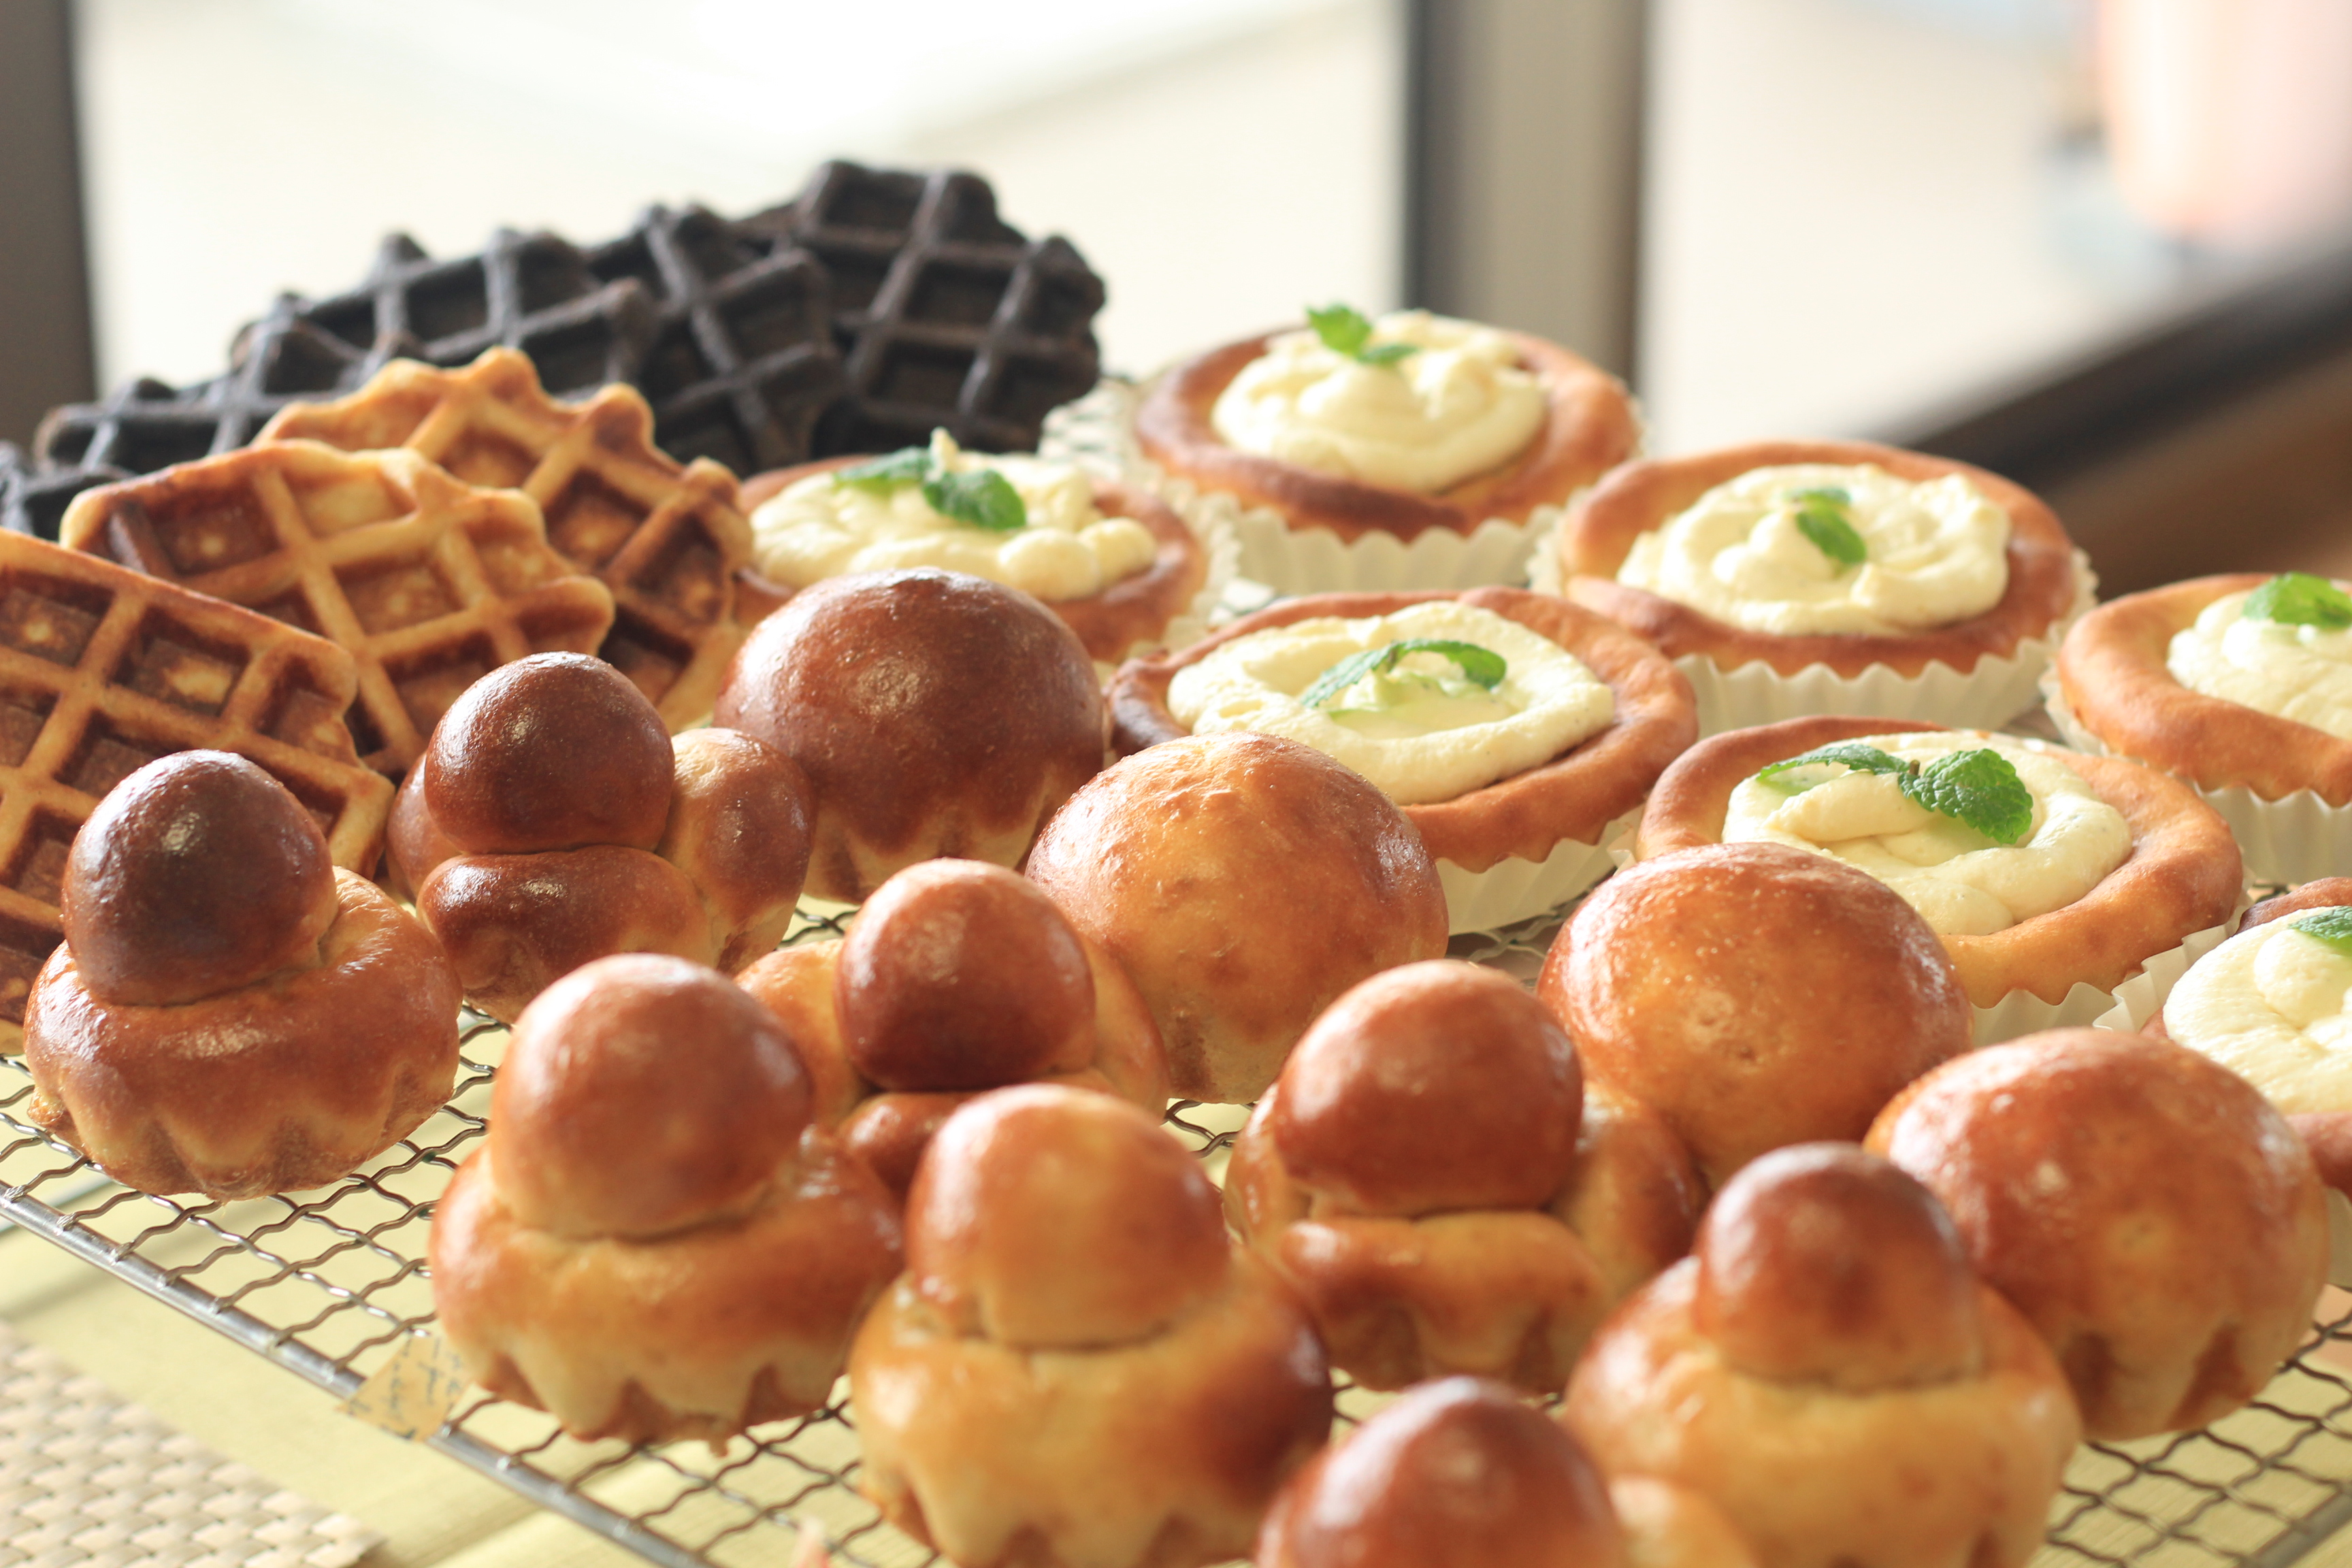 a-ta-sante糖質制限パン料理教室。京都江部粉糖質制限パンアドバンスコース1回目『ブリオッシュ・フロマージュブレッド・ワッフル